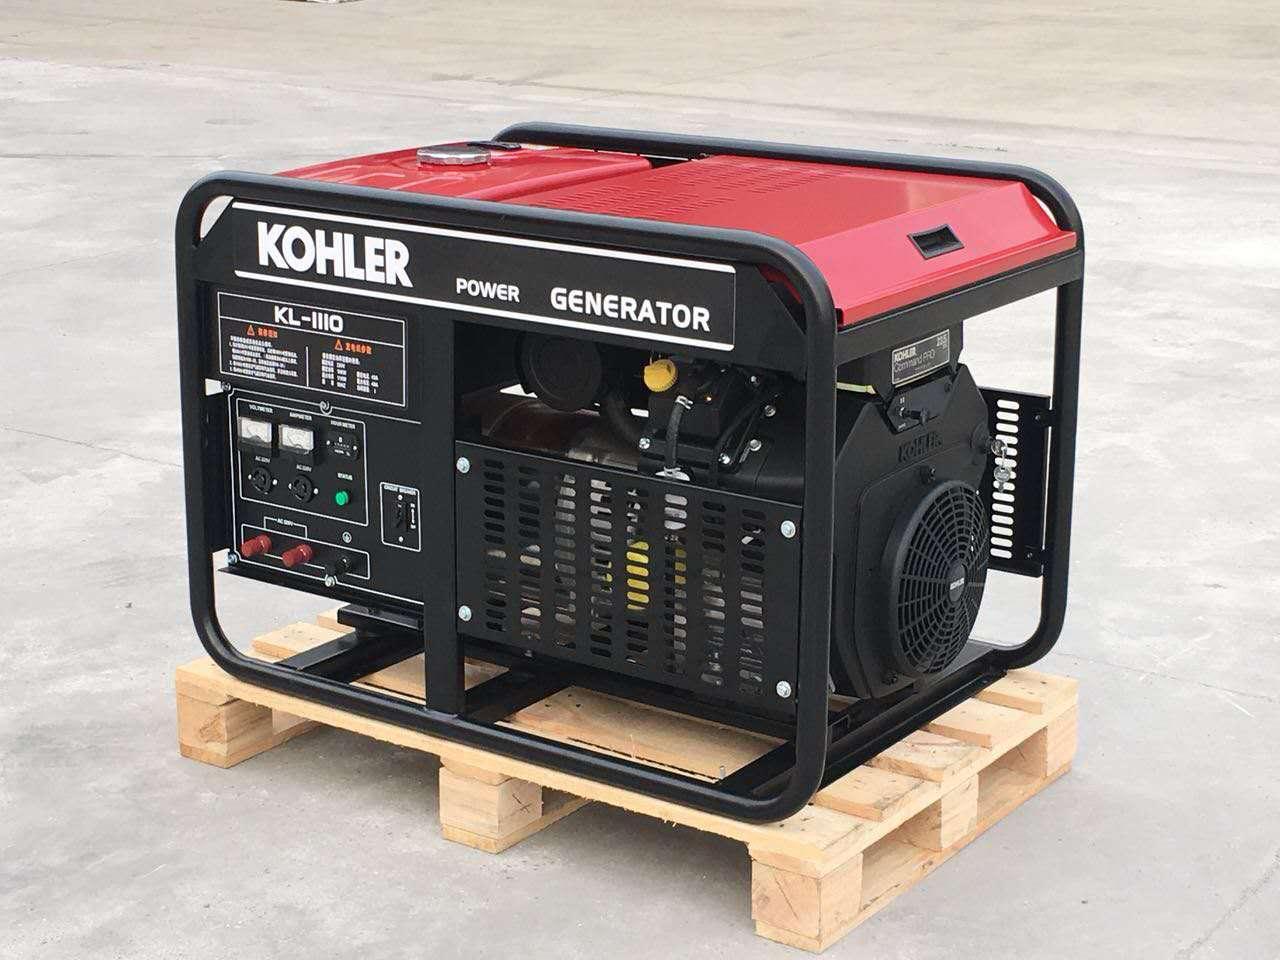 KL-1110美国科勒发电机10KW单相